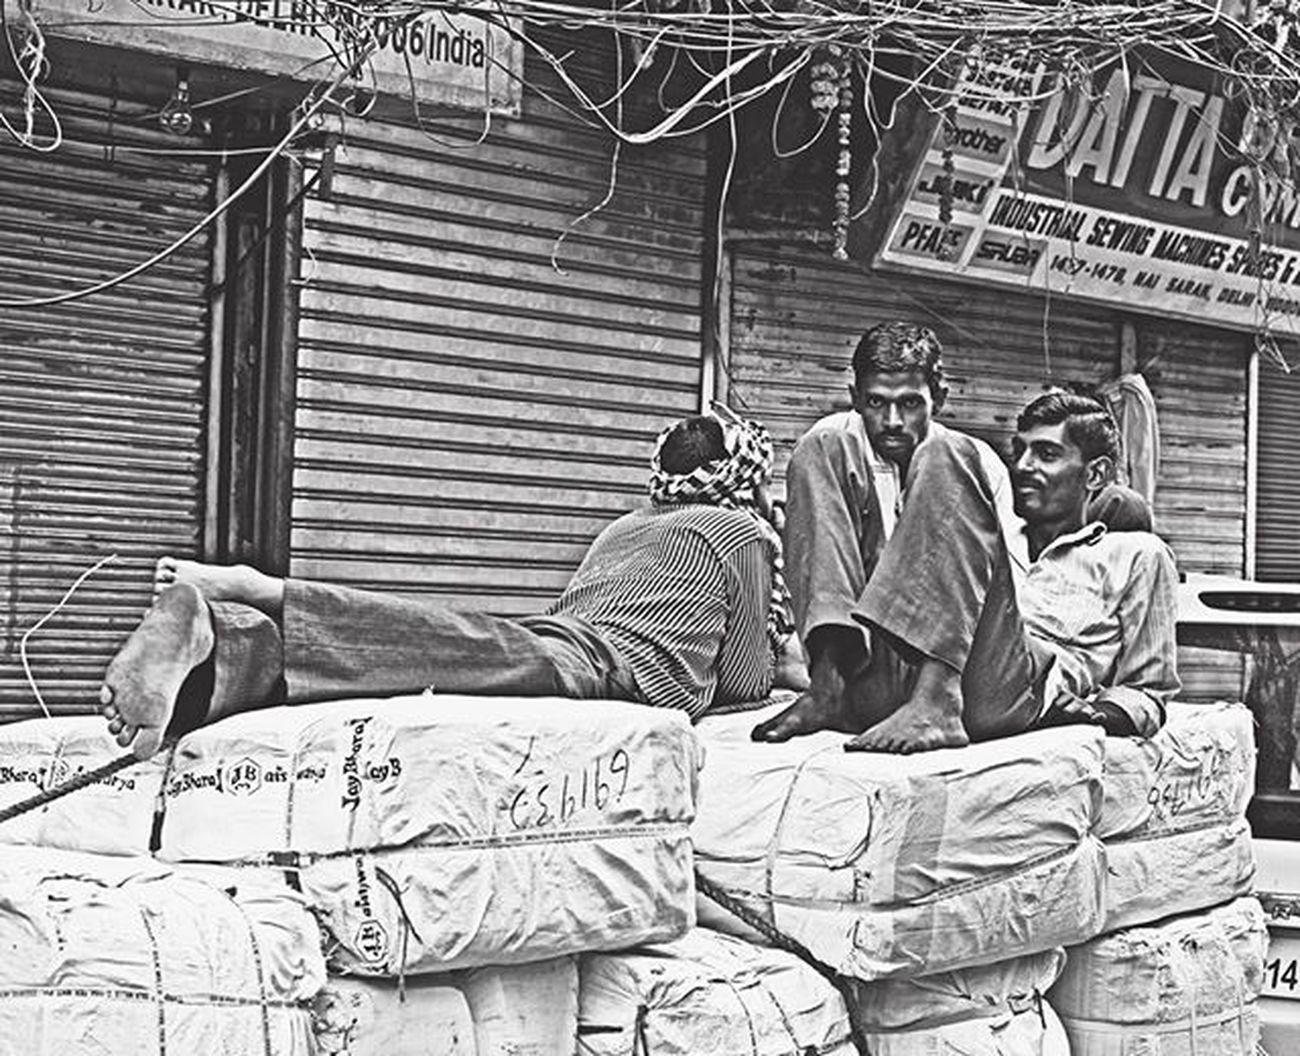 """ Chandni Chowk street "" Chandnichowk Street Early Morning Coworkers Enjoying Do Rest Streetphotography Blackandwhite Gulfam Fotofinch Incredibleindia Travelphotography Travel Delhi India Street Portrait Delhi_igers Dfordelhi _soi Sodelhi Indianphoto Photographer delhigram delhidiaries rsa_street rsa_india streetphoto"